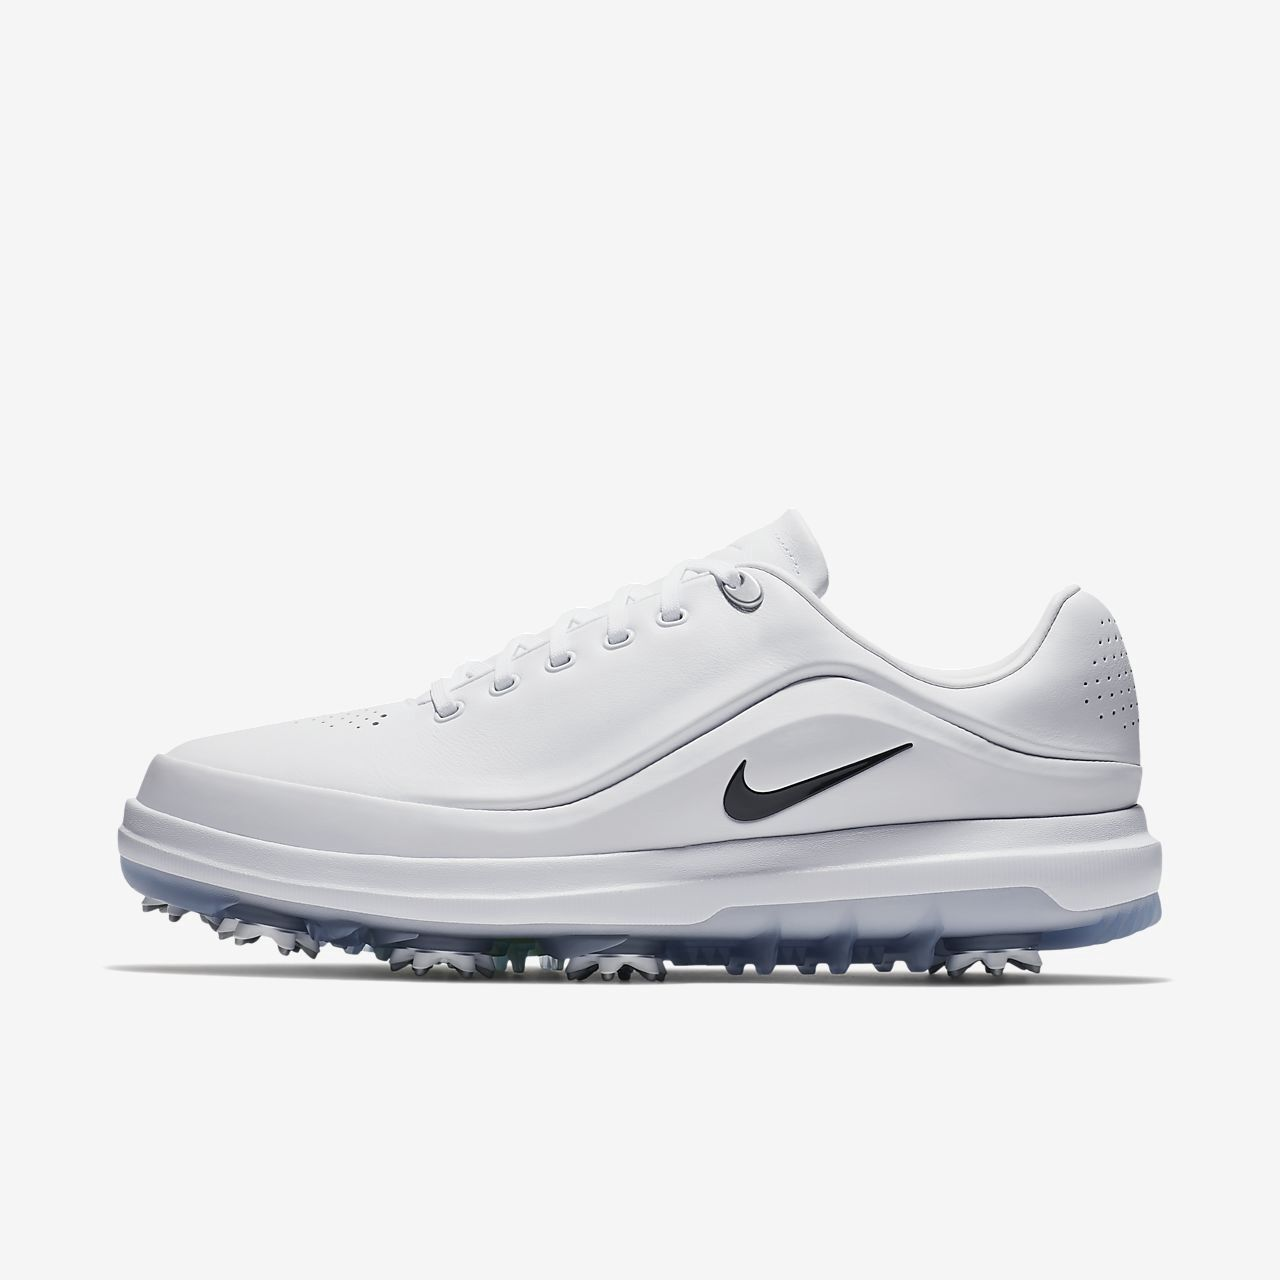 Nike Air Zoom Precision Men's Golf Shoe 7 White golf